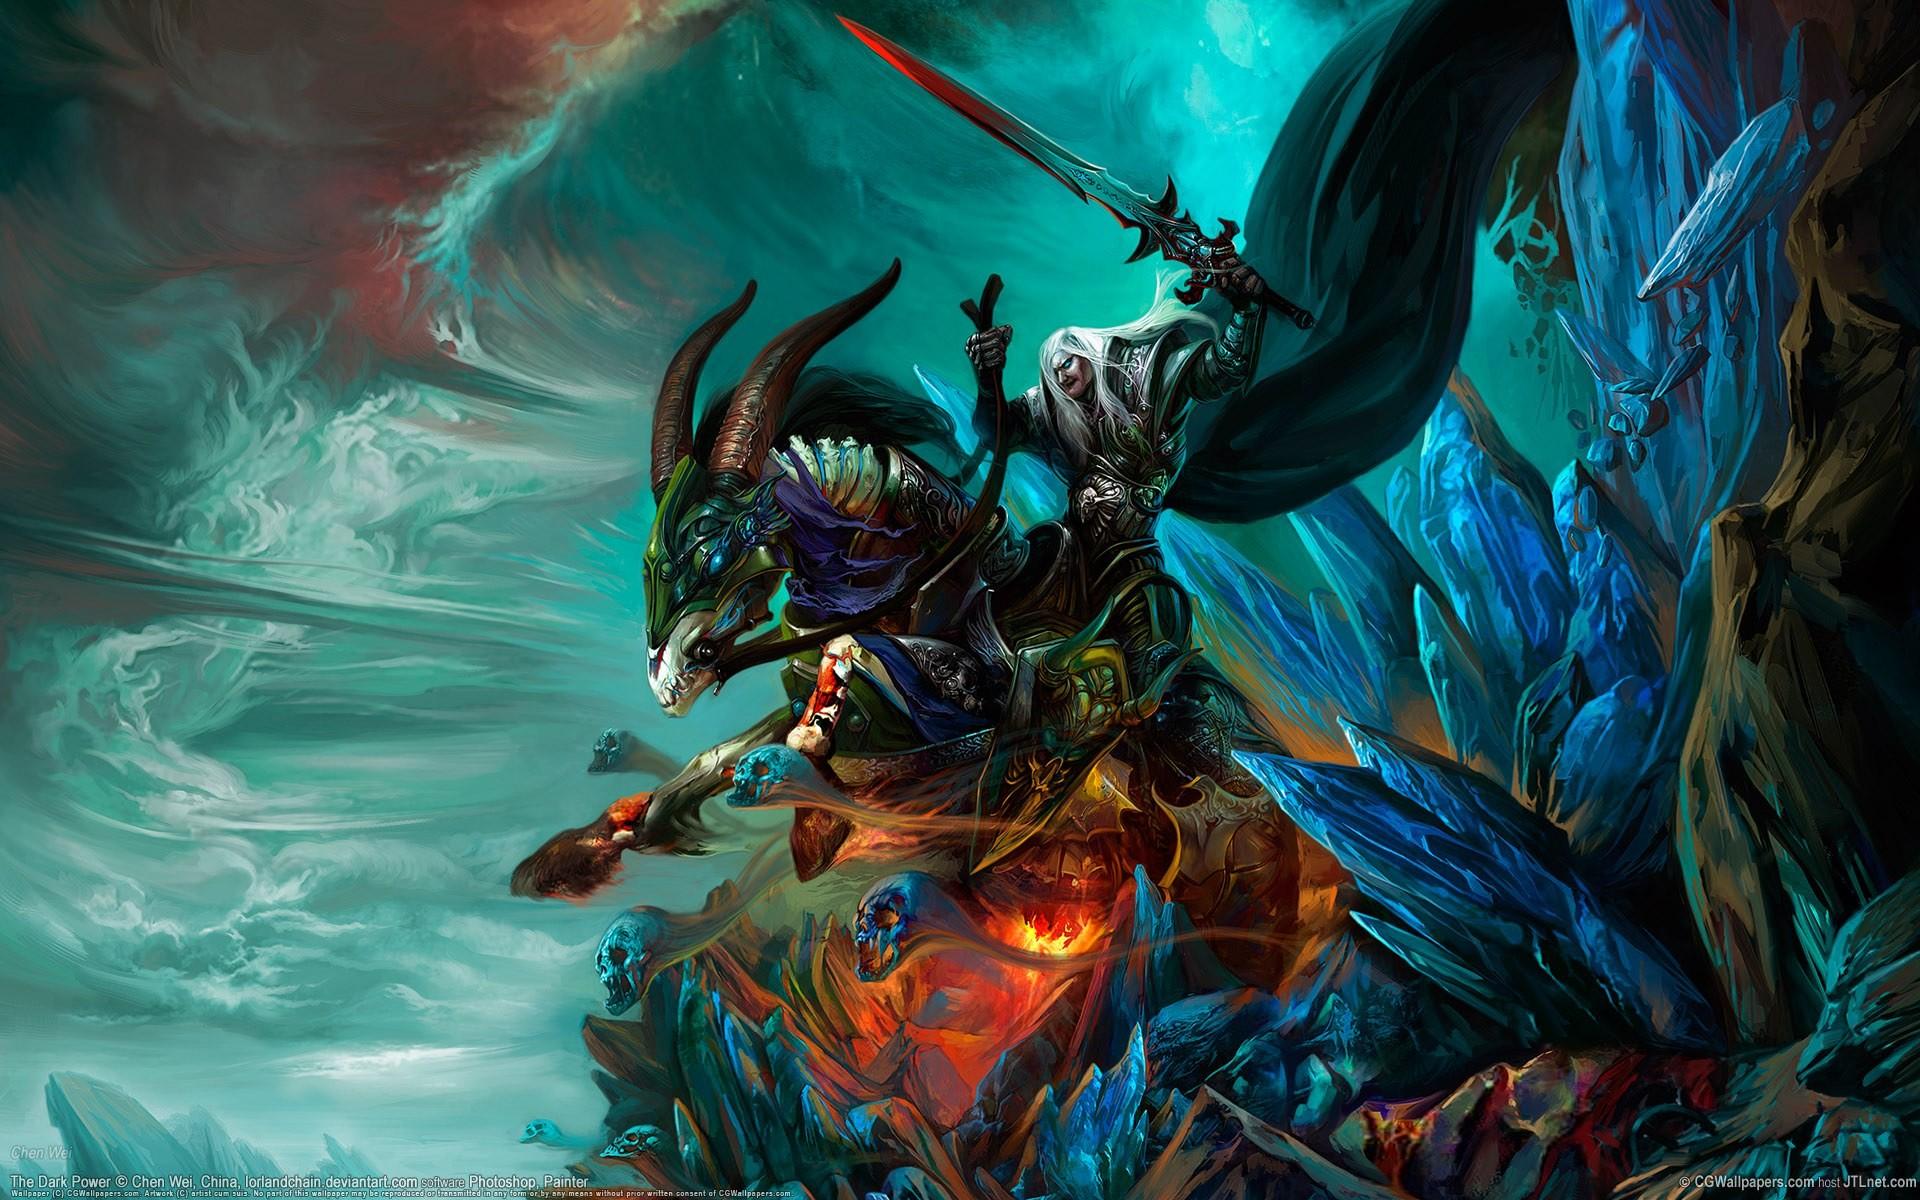 Dark Fantasy Wallpaper Hd Free Download   Wallpapers 4k   Pinterest   Dark  fantasy, Wallpaper and Dark